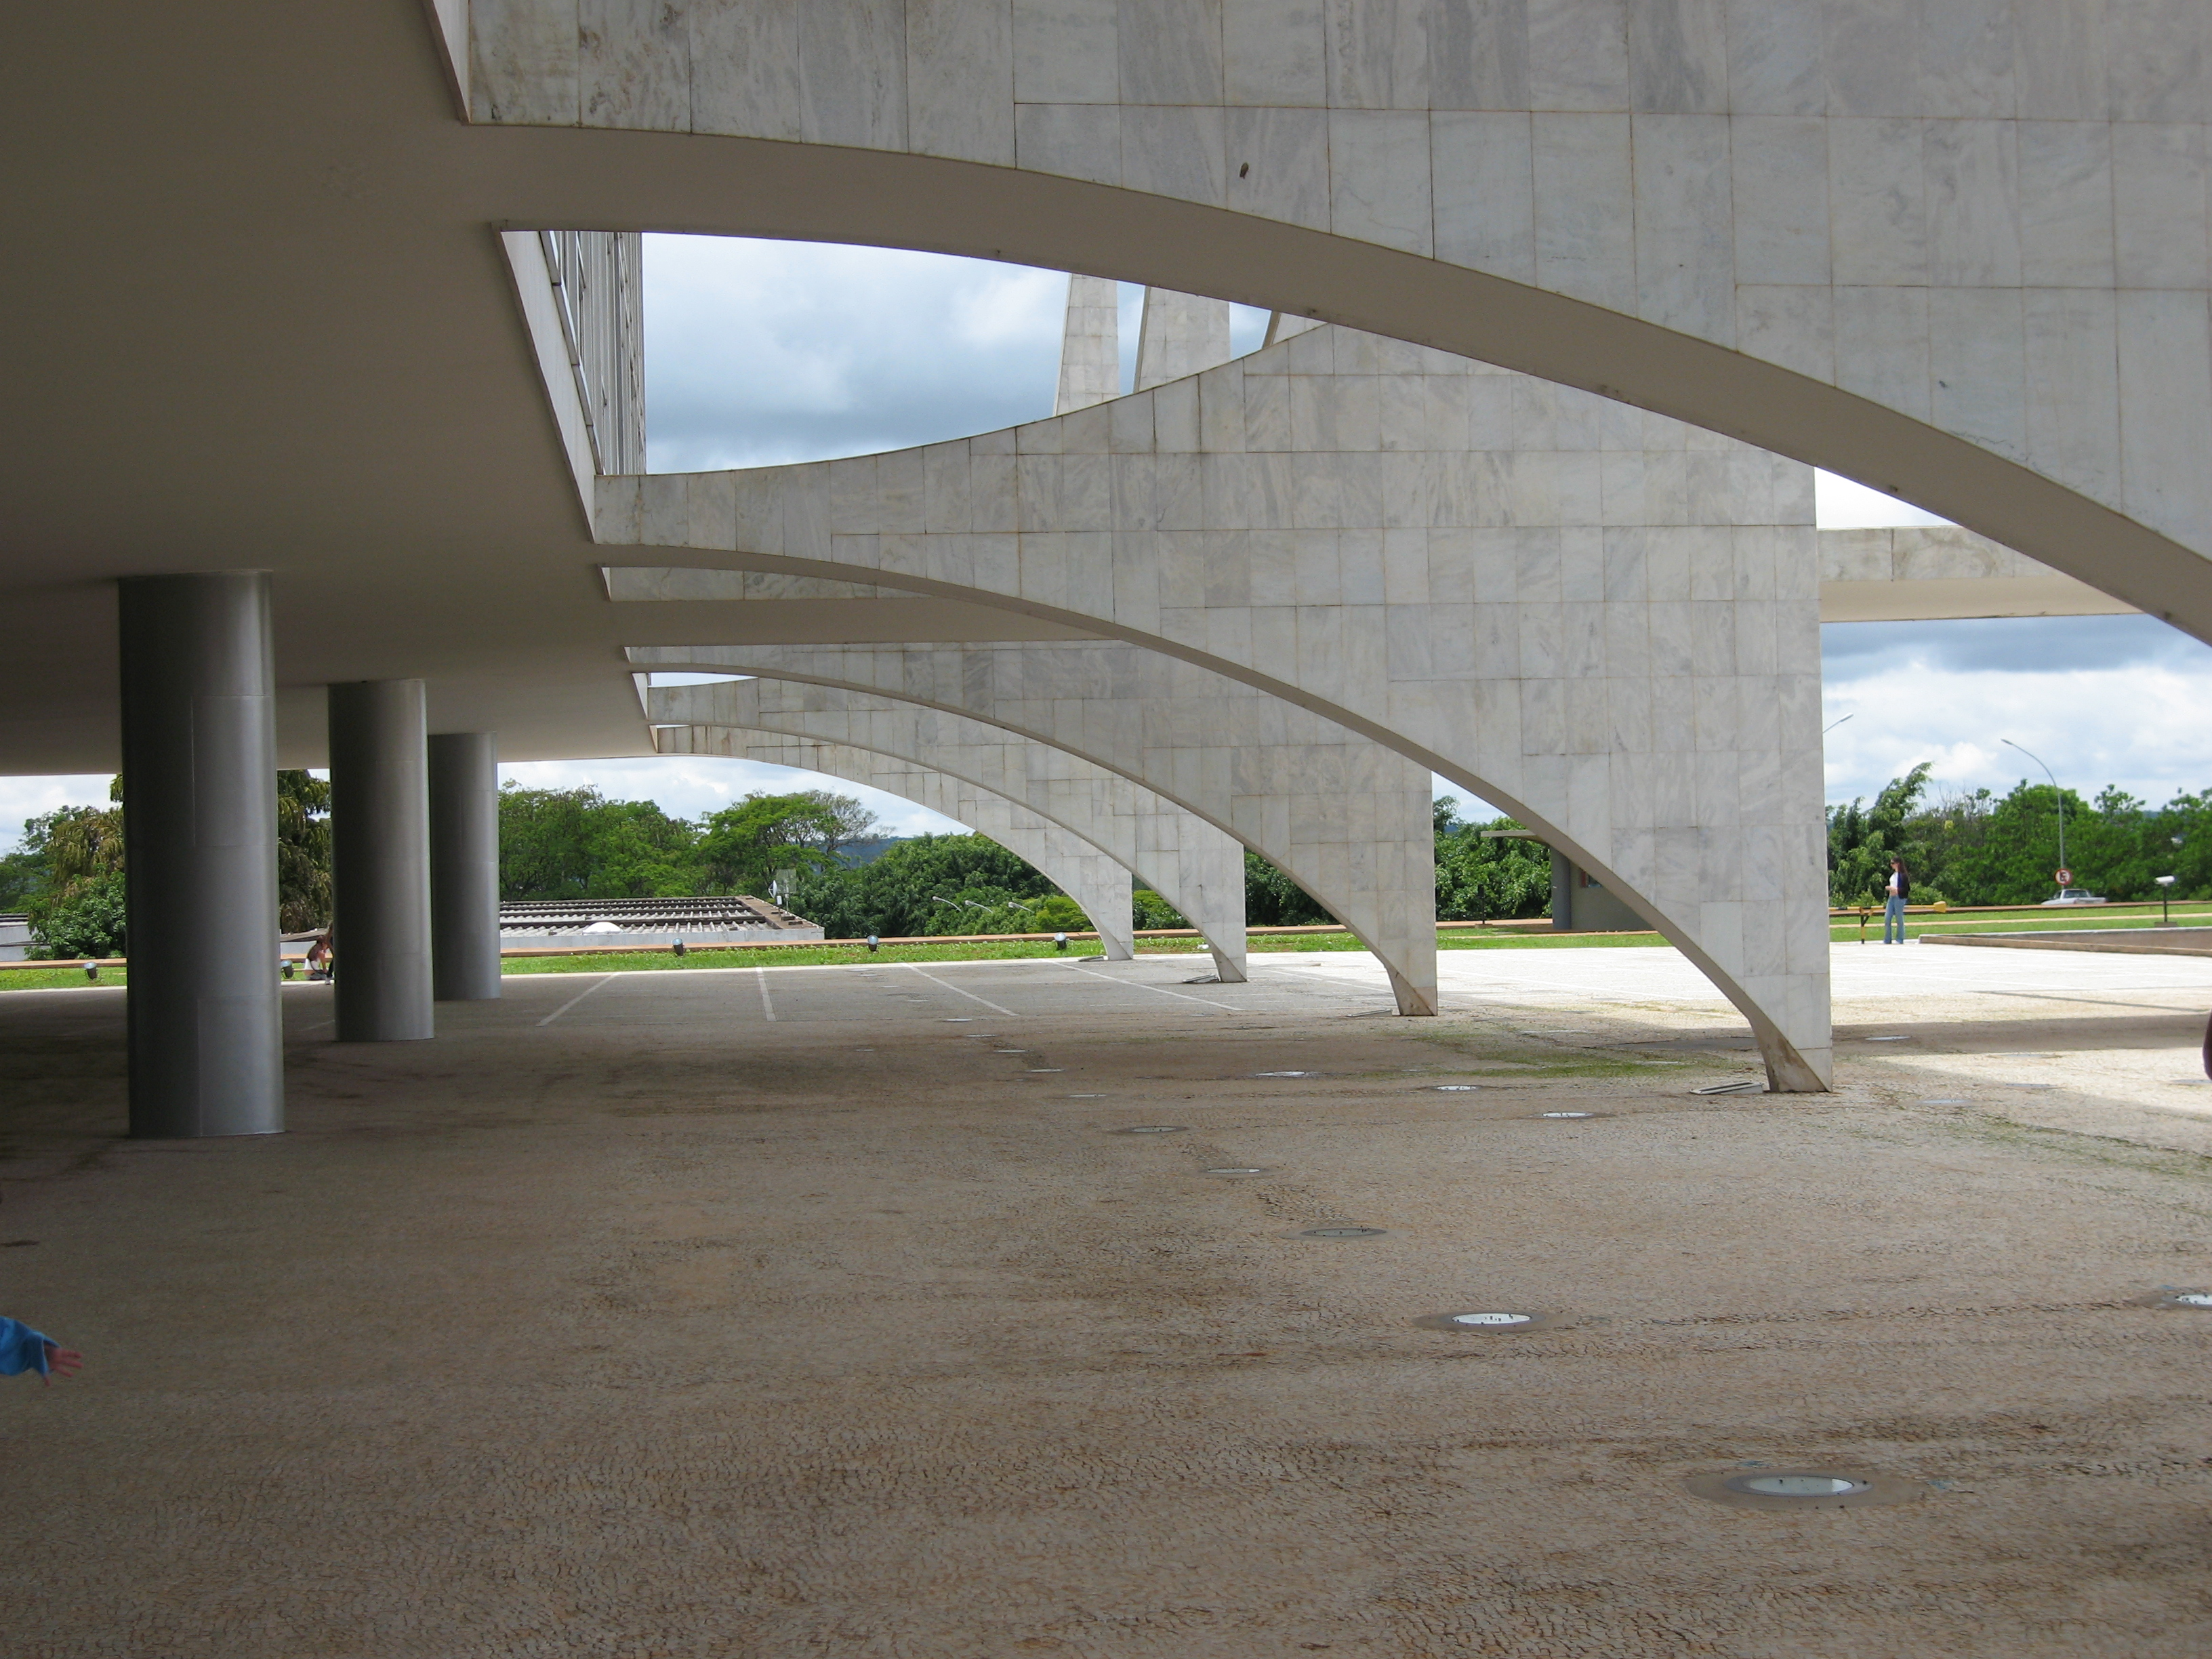 Brasilia_10_1135